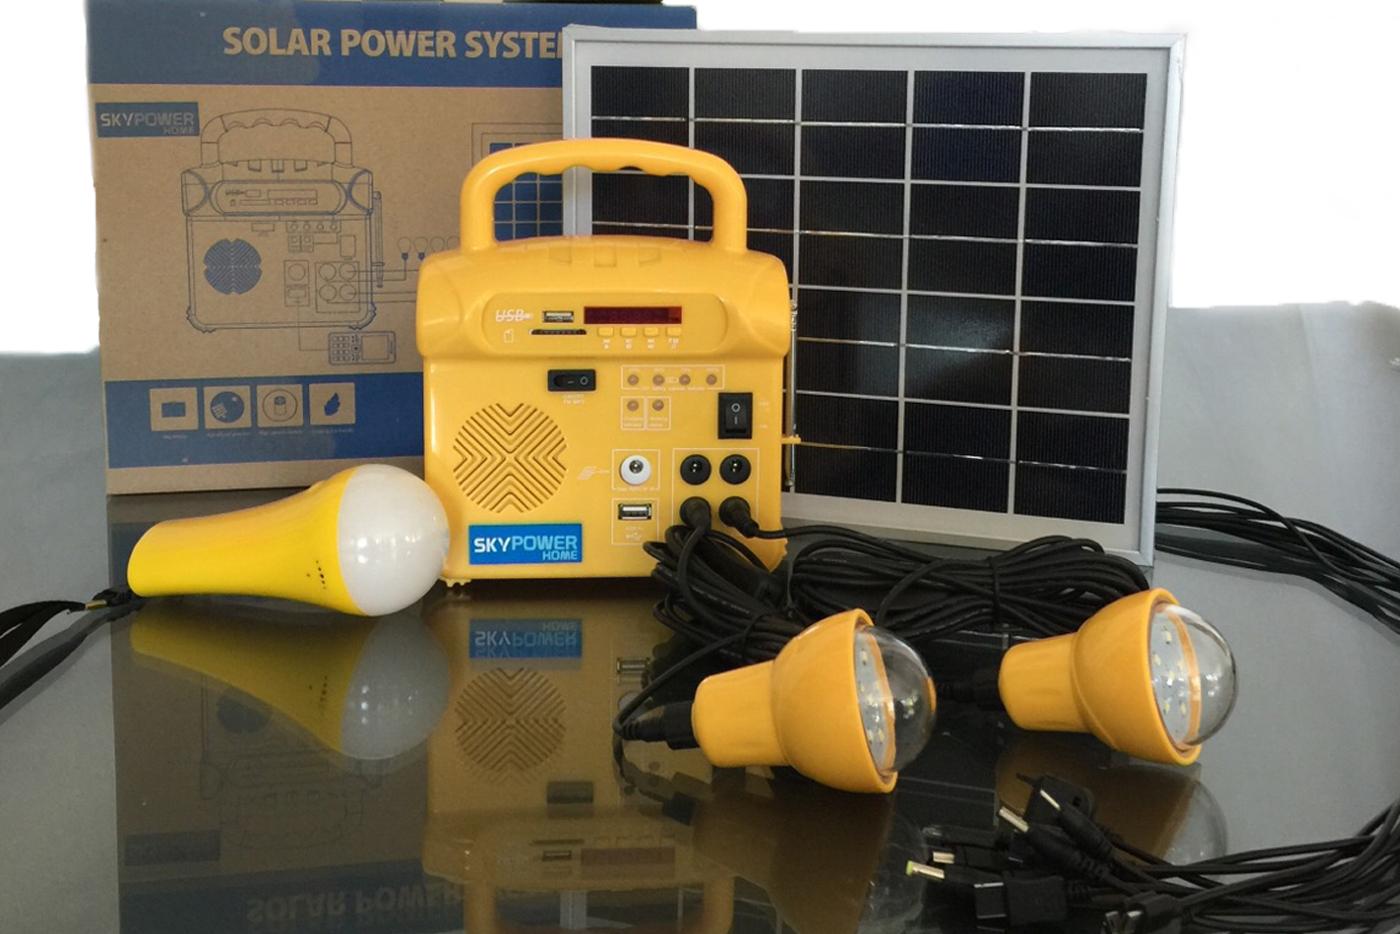 Plan International and SkyPower bring light to rural Kenya through 2 million home solar kits